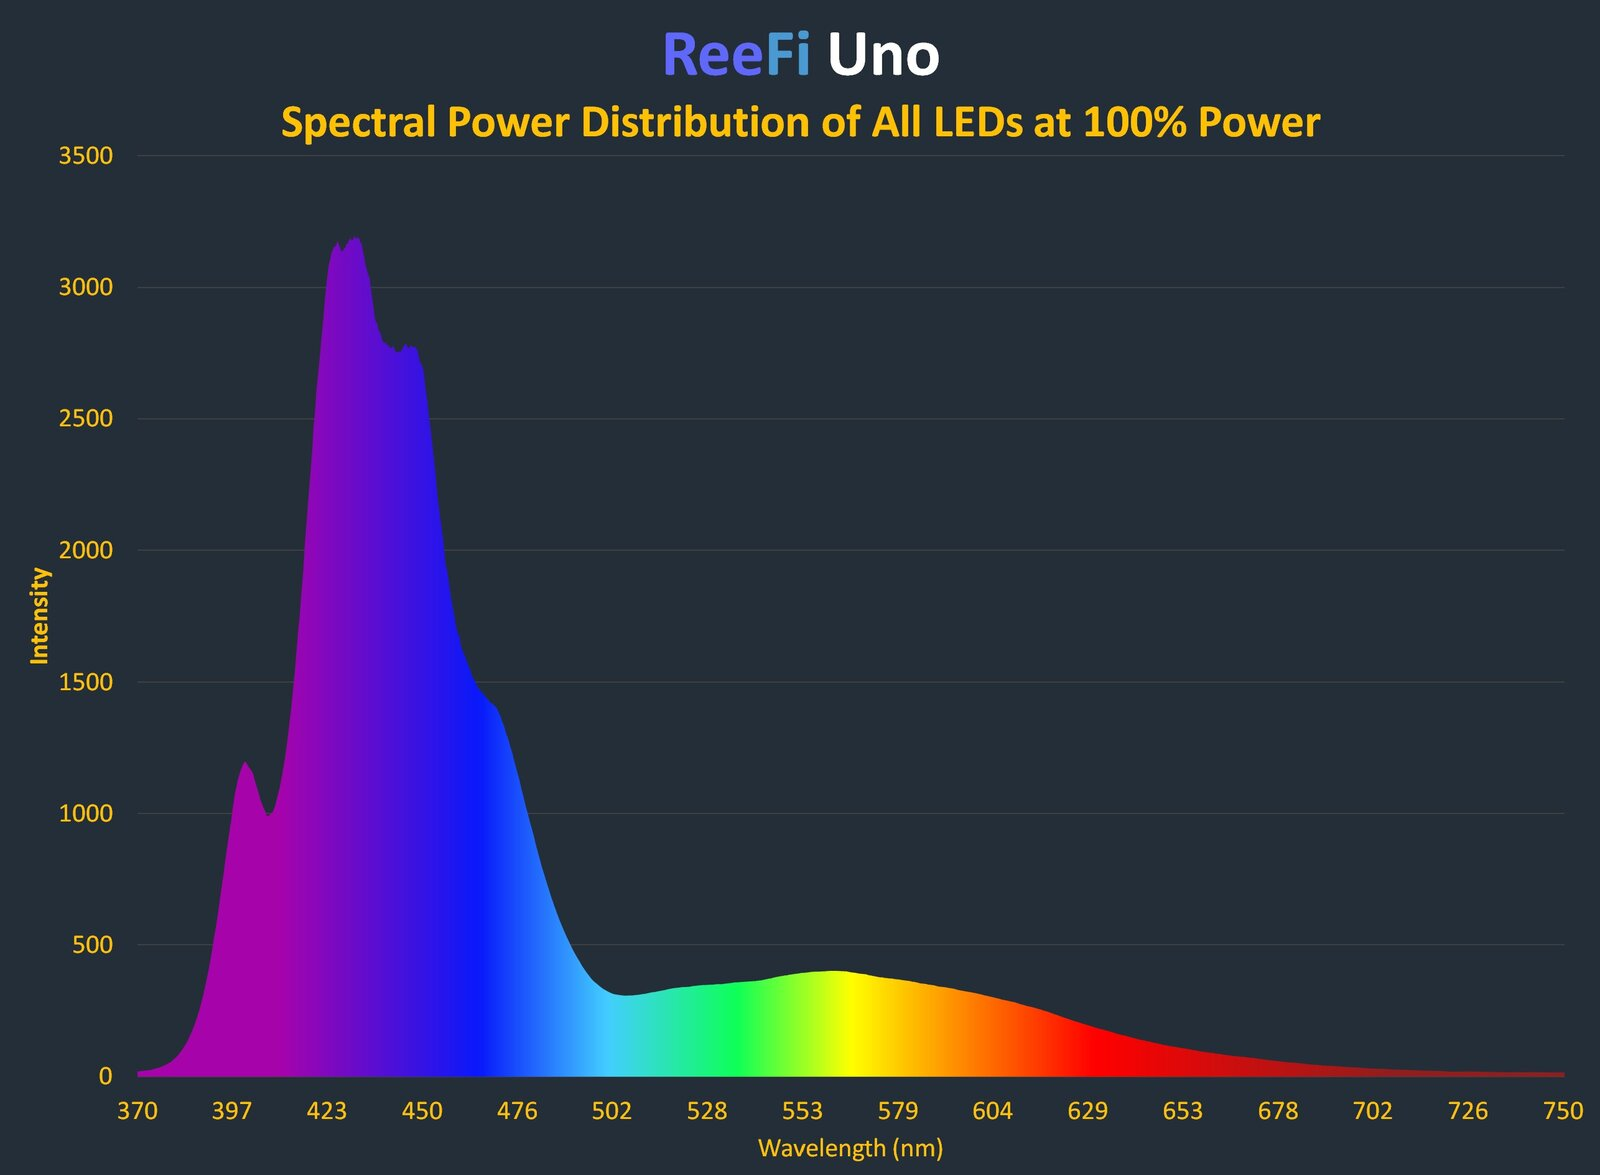 ReeFi_Uno_Spectral_distribution.jpg